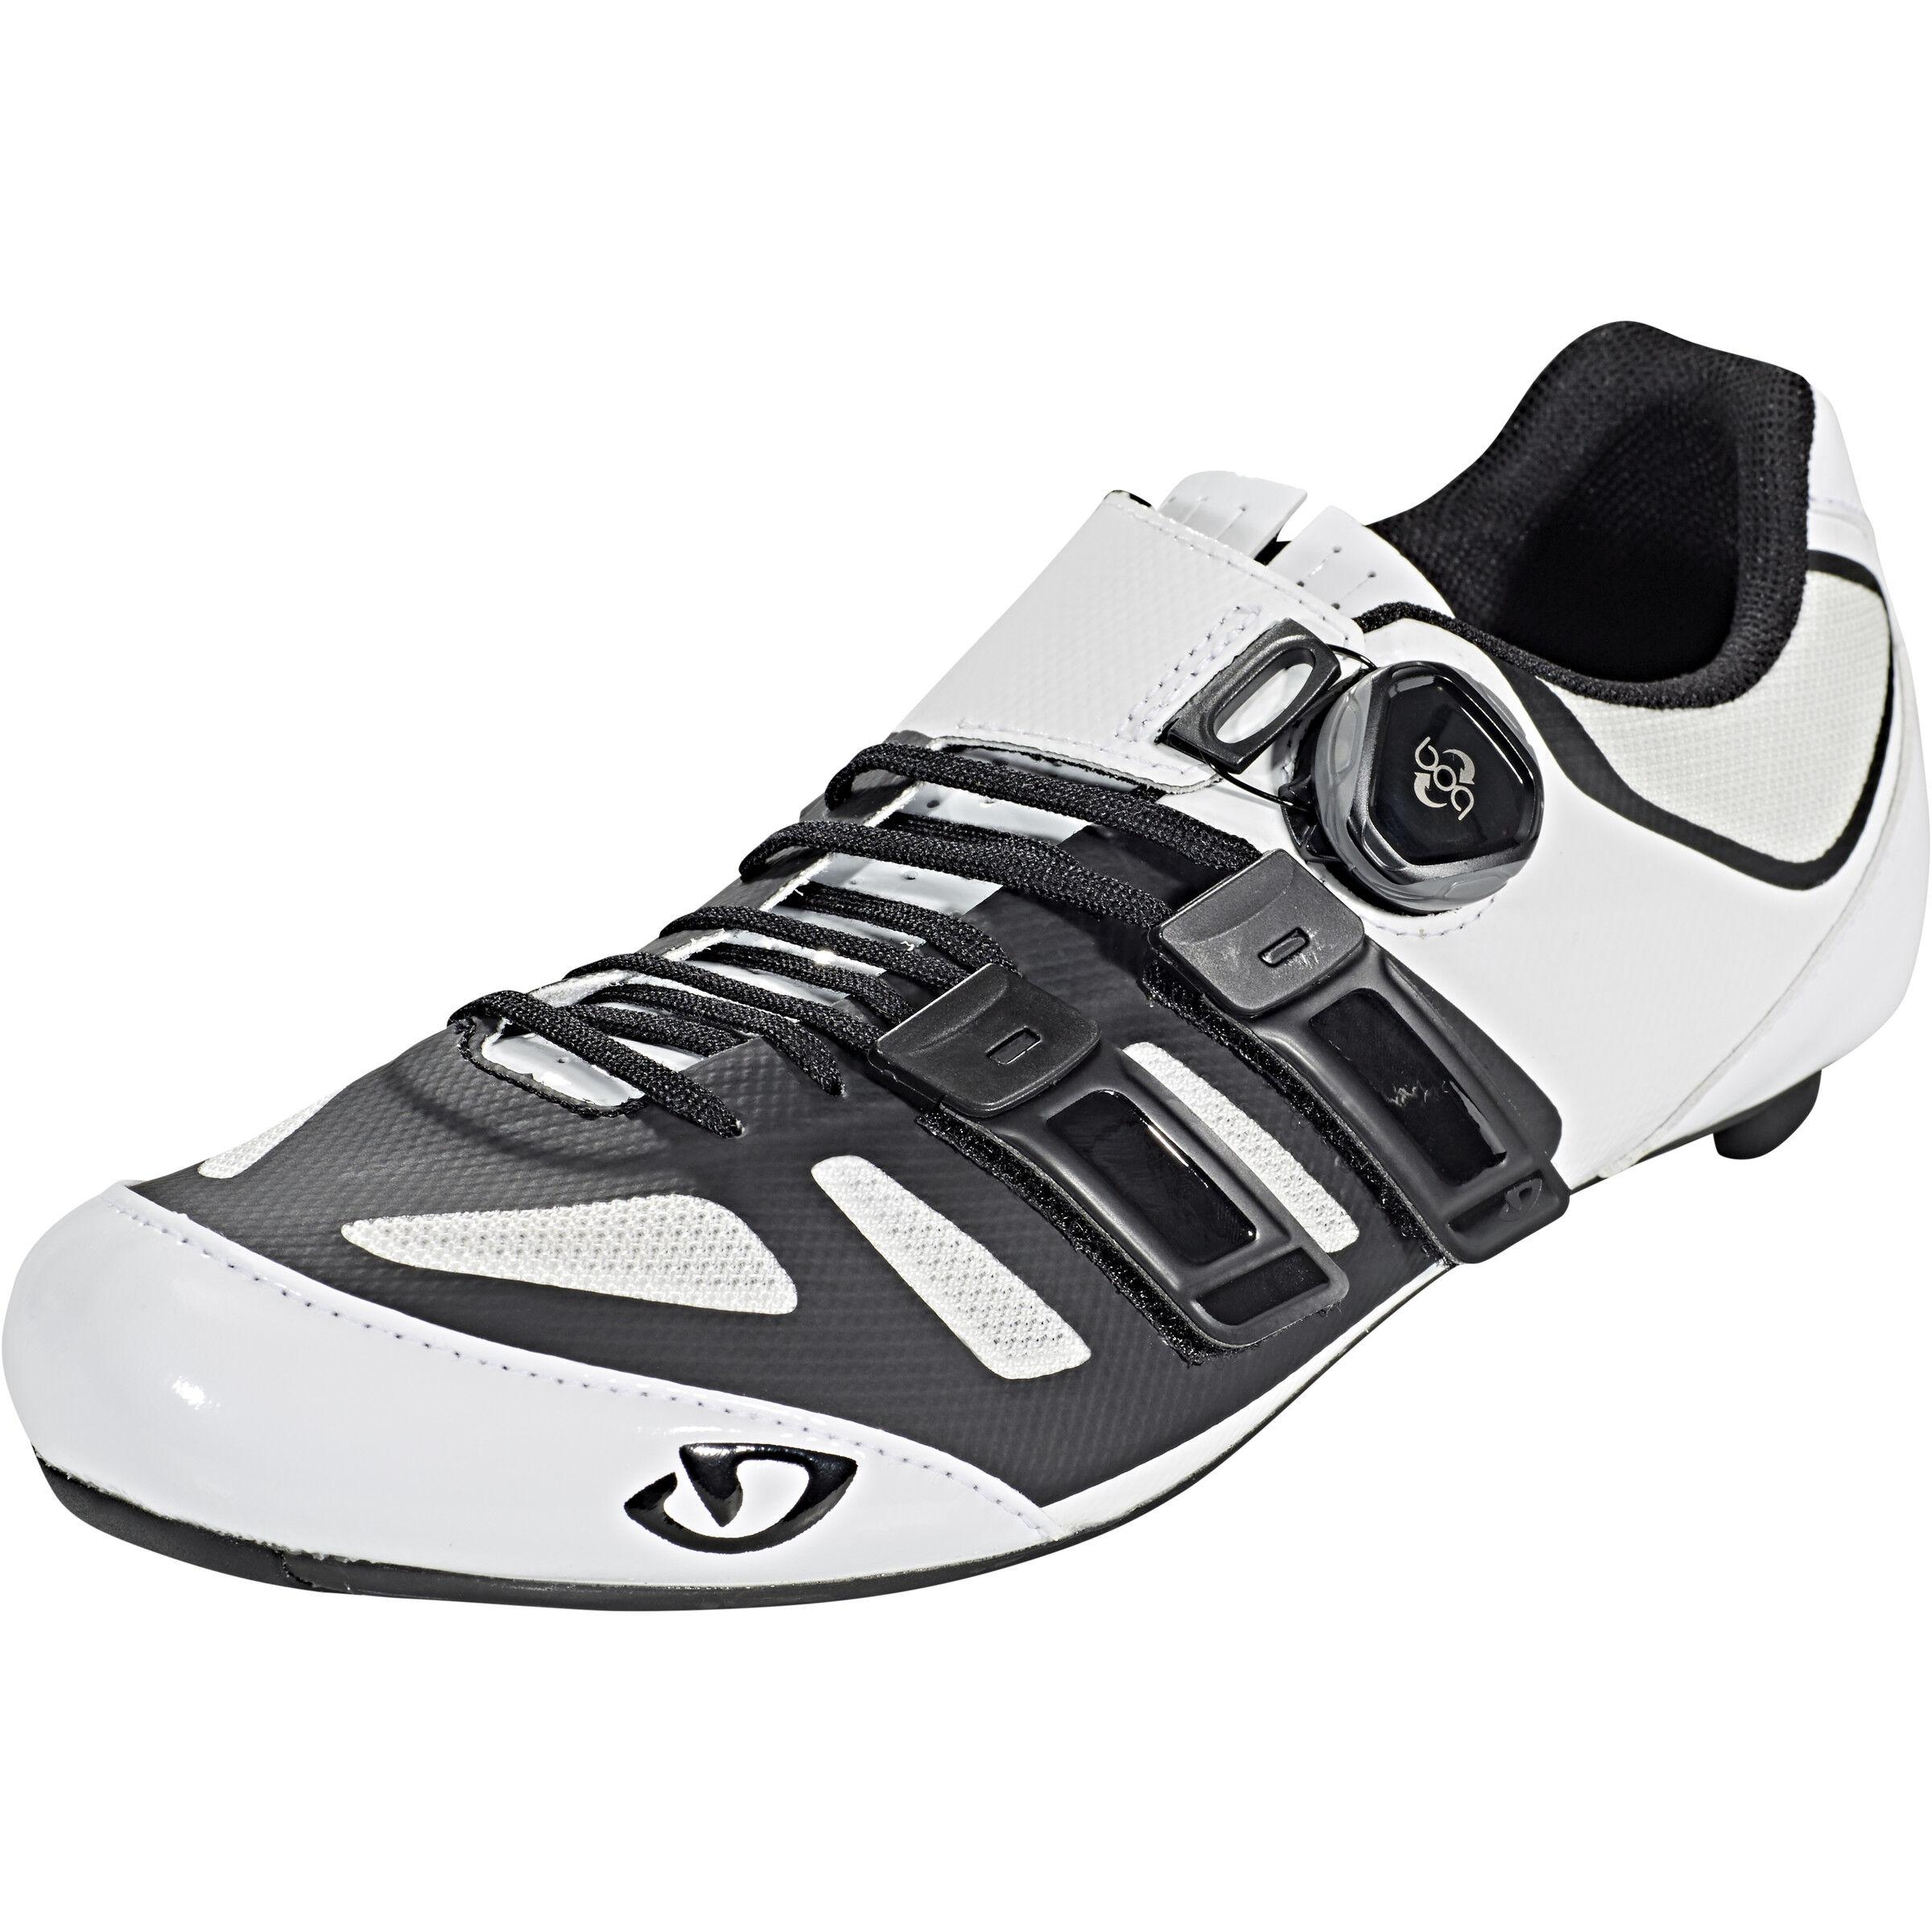 Northwave Rebel MTB Schuhe greyred Herren Schuhe XC All